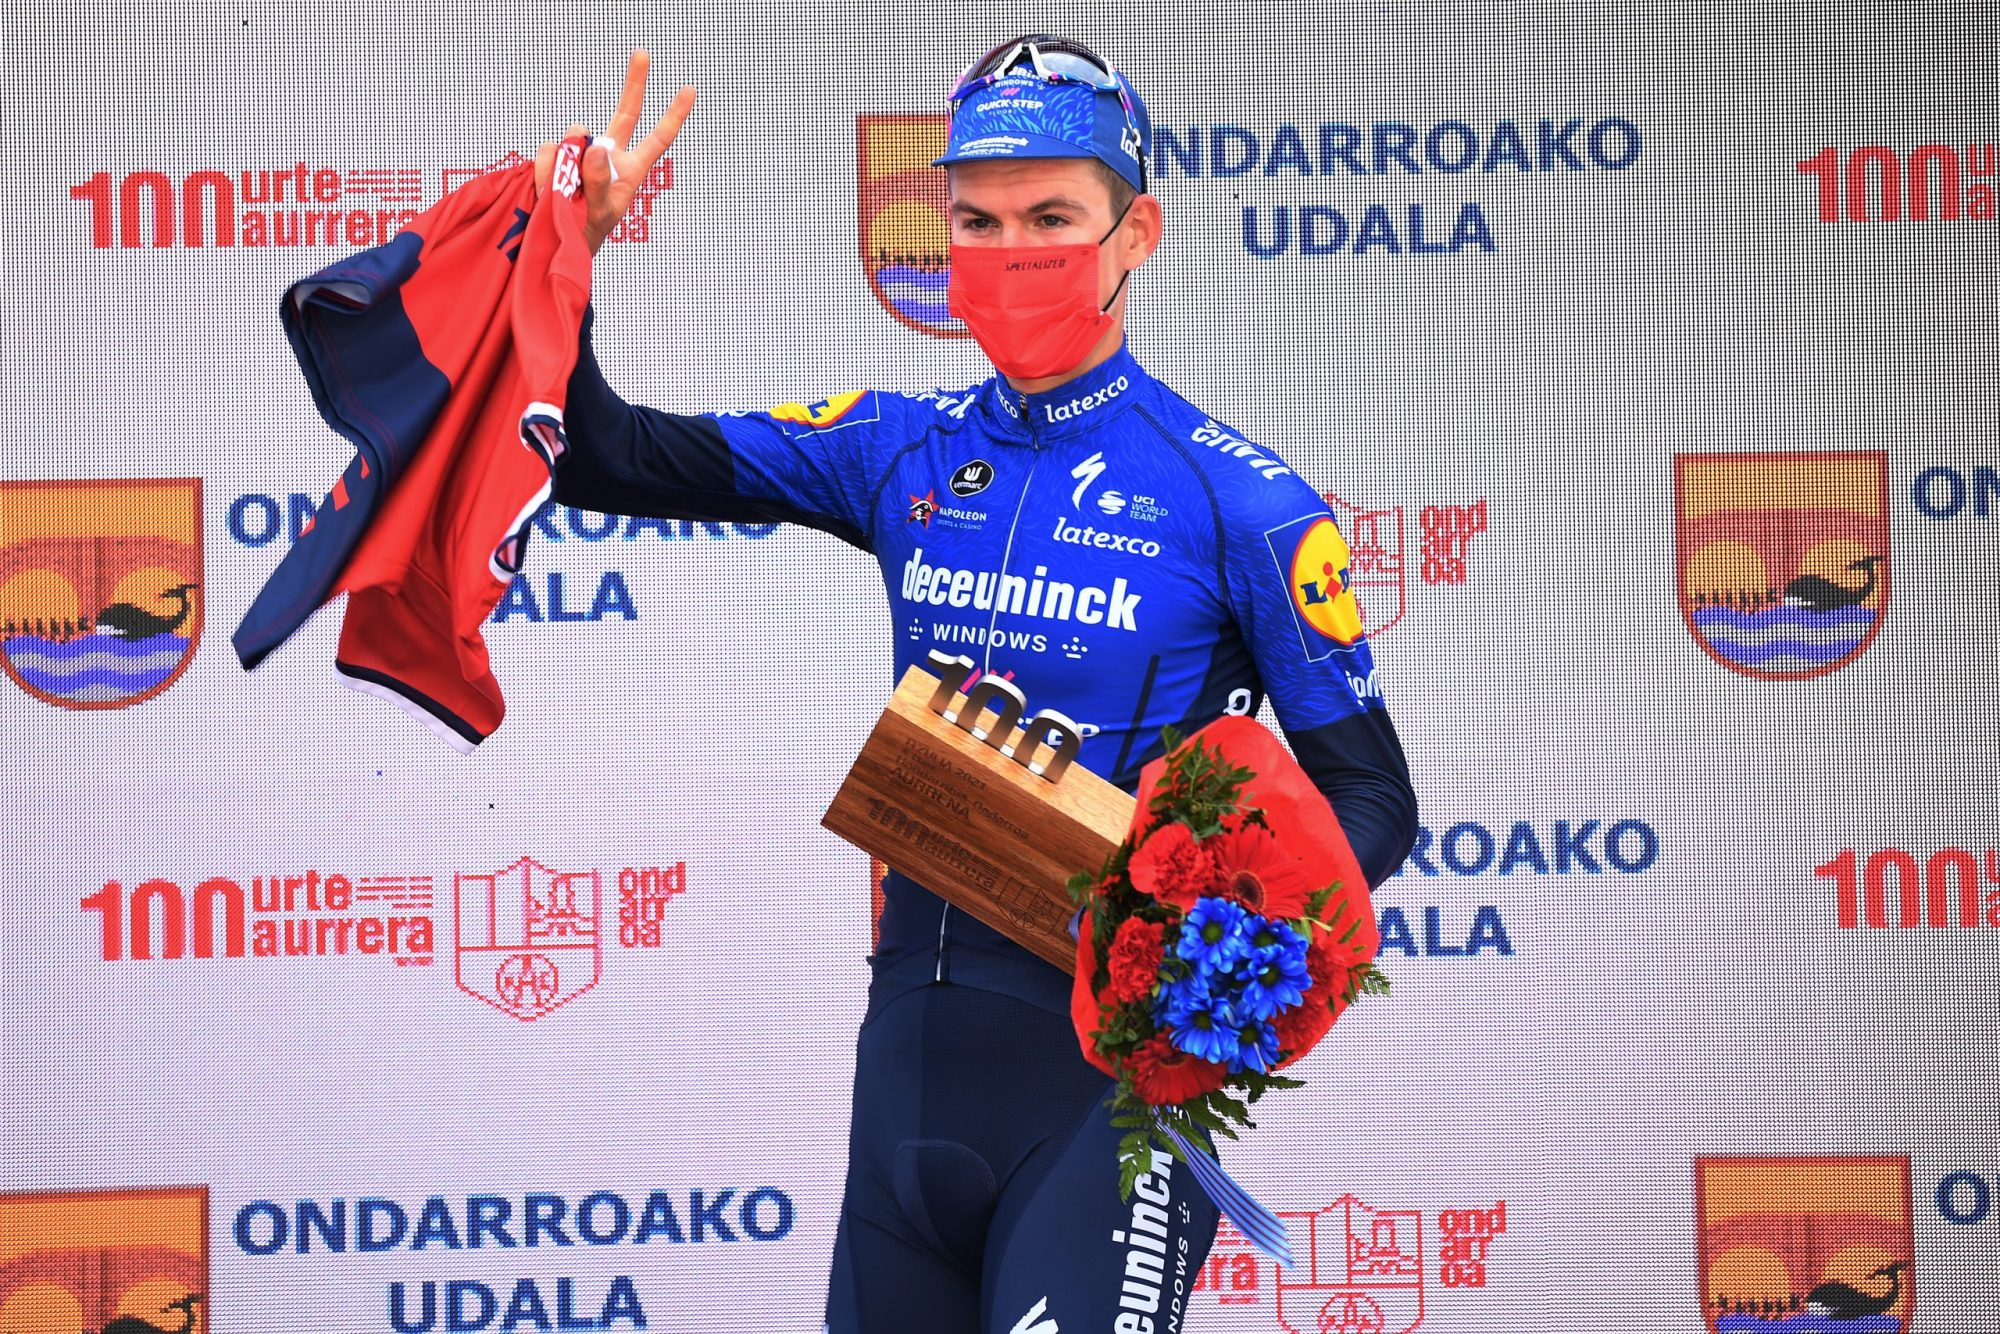 """Wir inspirieren uns ständig"": Deceuninck – Quick-Step-Fliegen nach dem 15. Saisonsieg bei der Tour of the Basque Country"